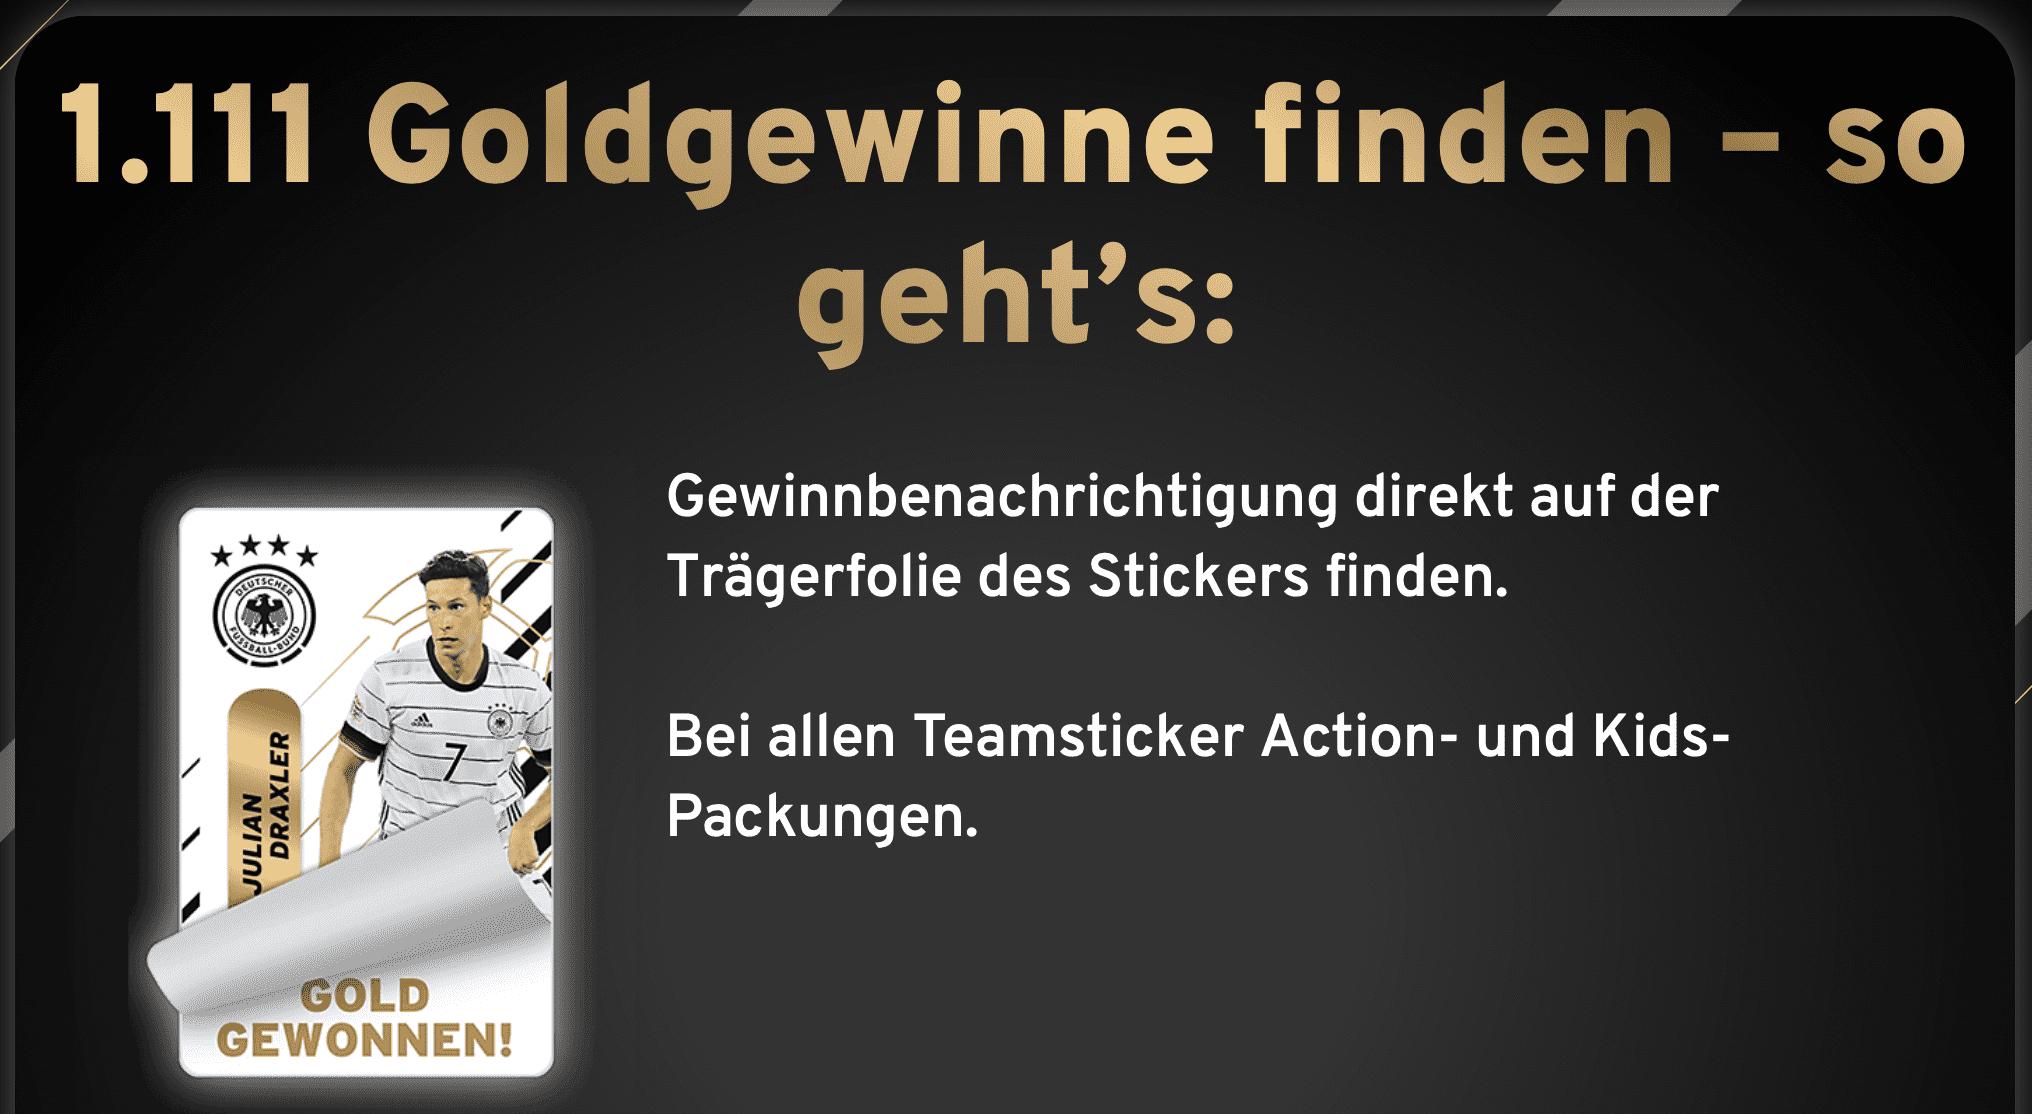 Gewinnspiel- Cases FMCG Süßwaren & Snacks Ferrero Goldgewinne